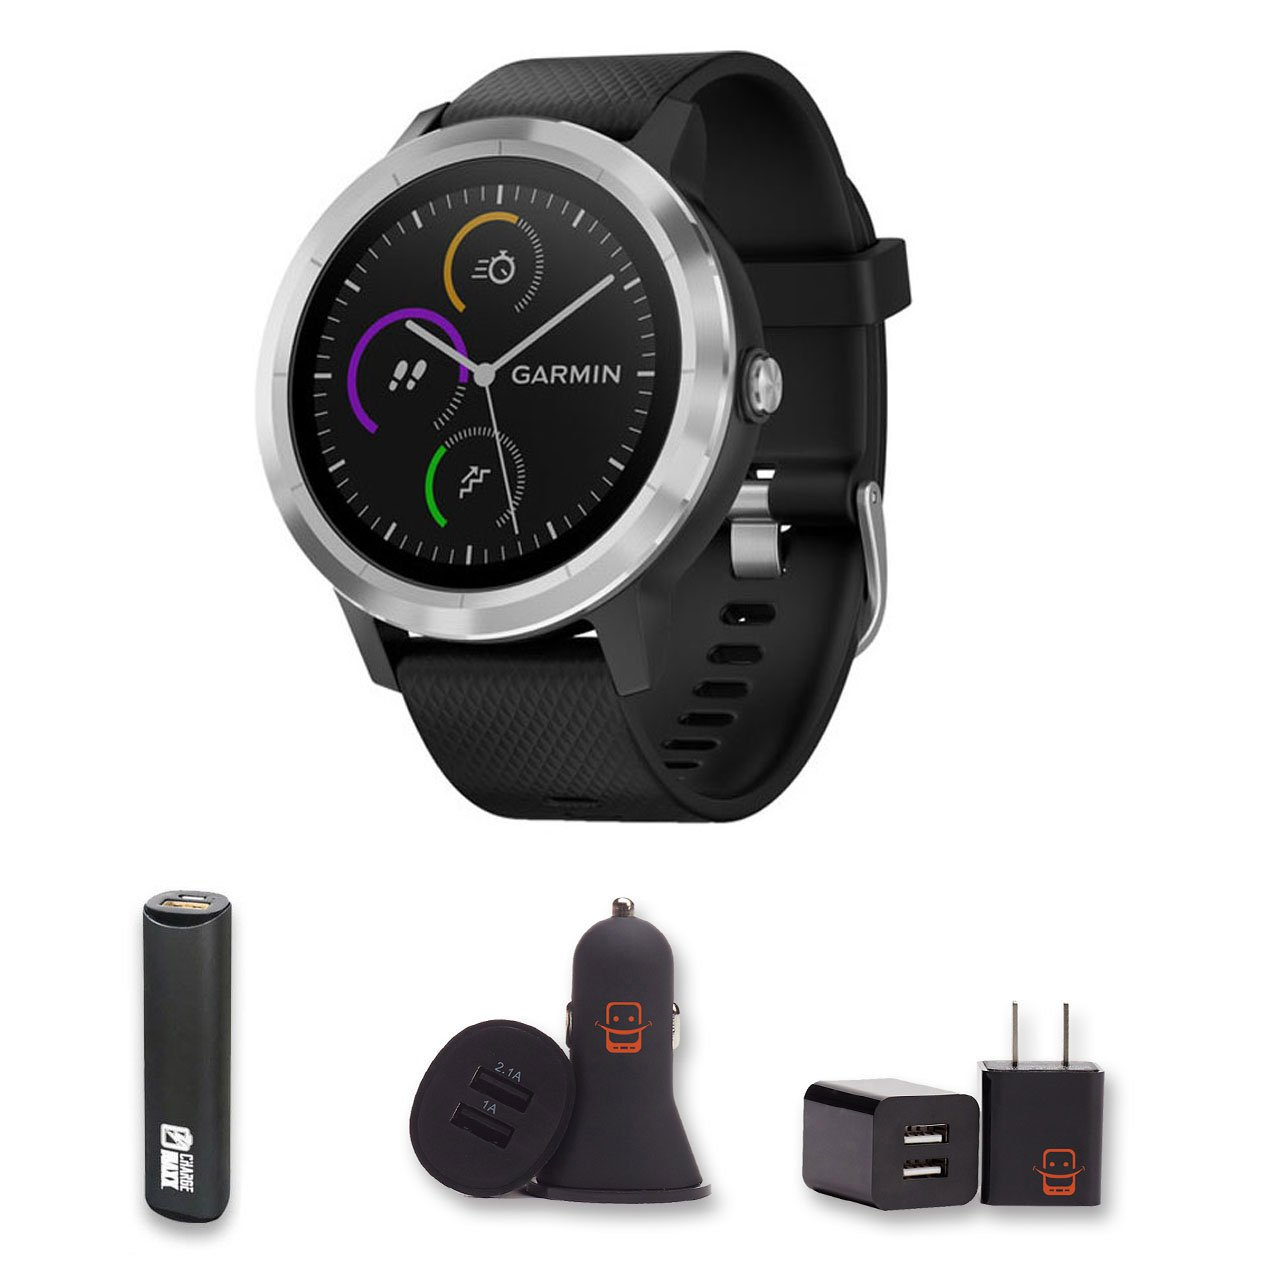 Garmin Vivoactive 3 (Black) GPS Smartwatch + PowerBank + USB Car Charger + USB Wall Charger, EZEE Bundle